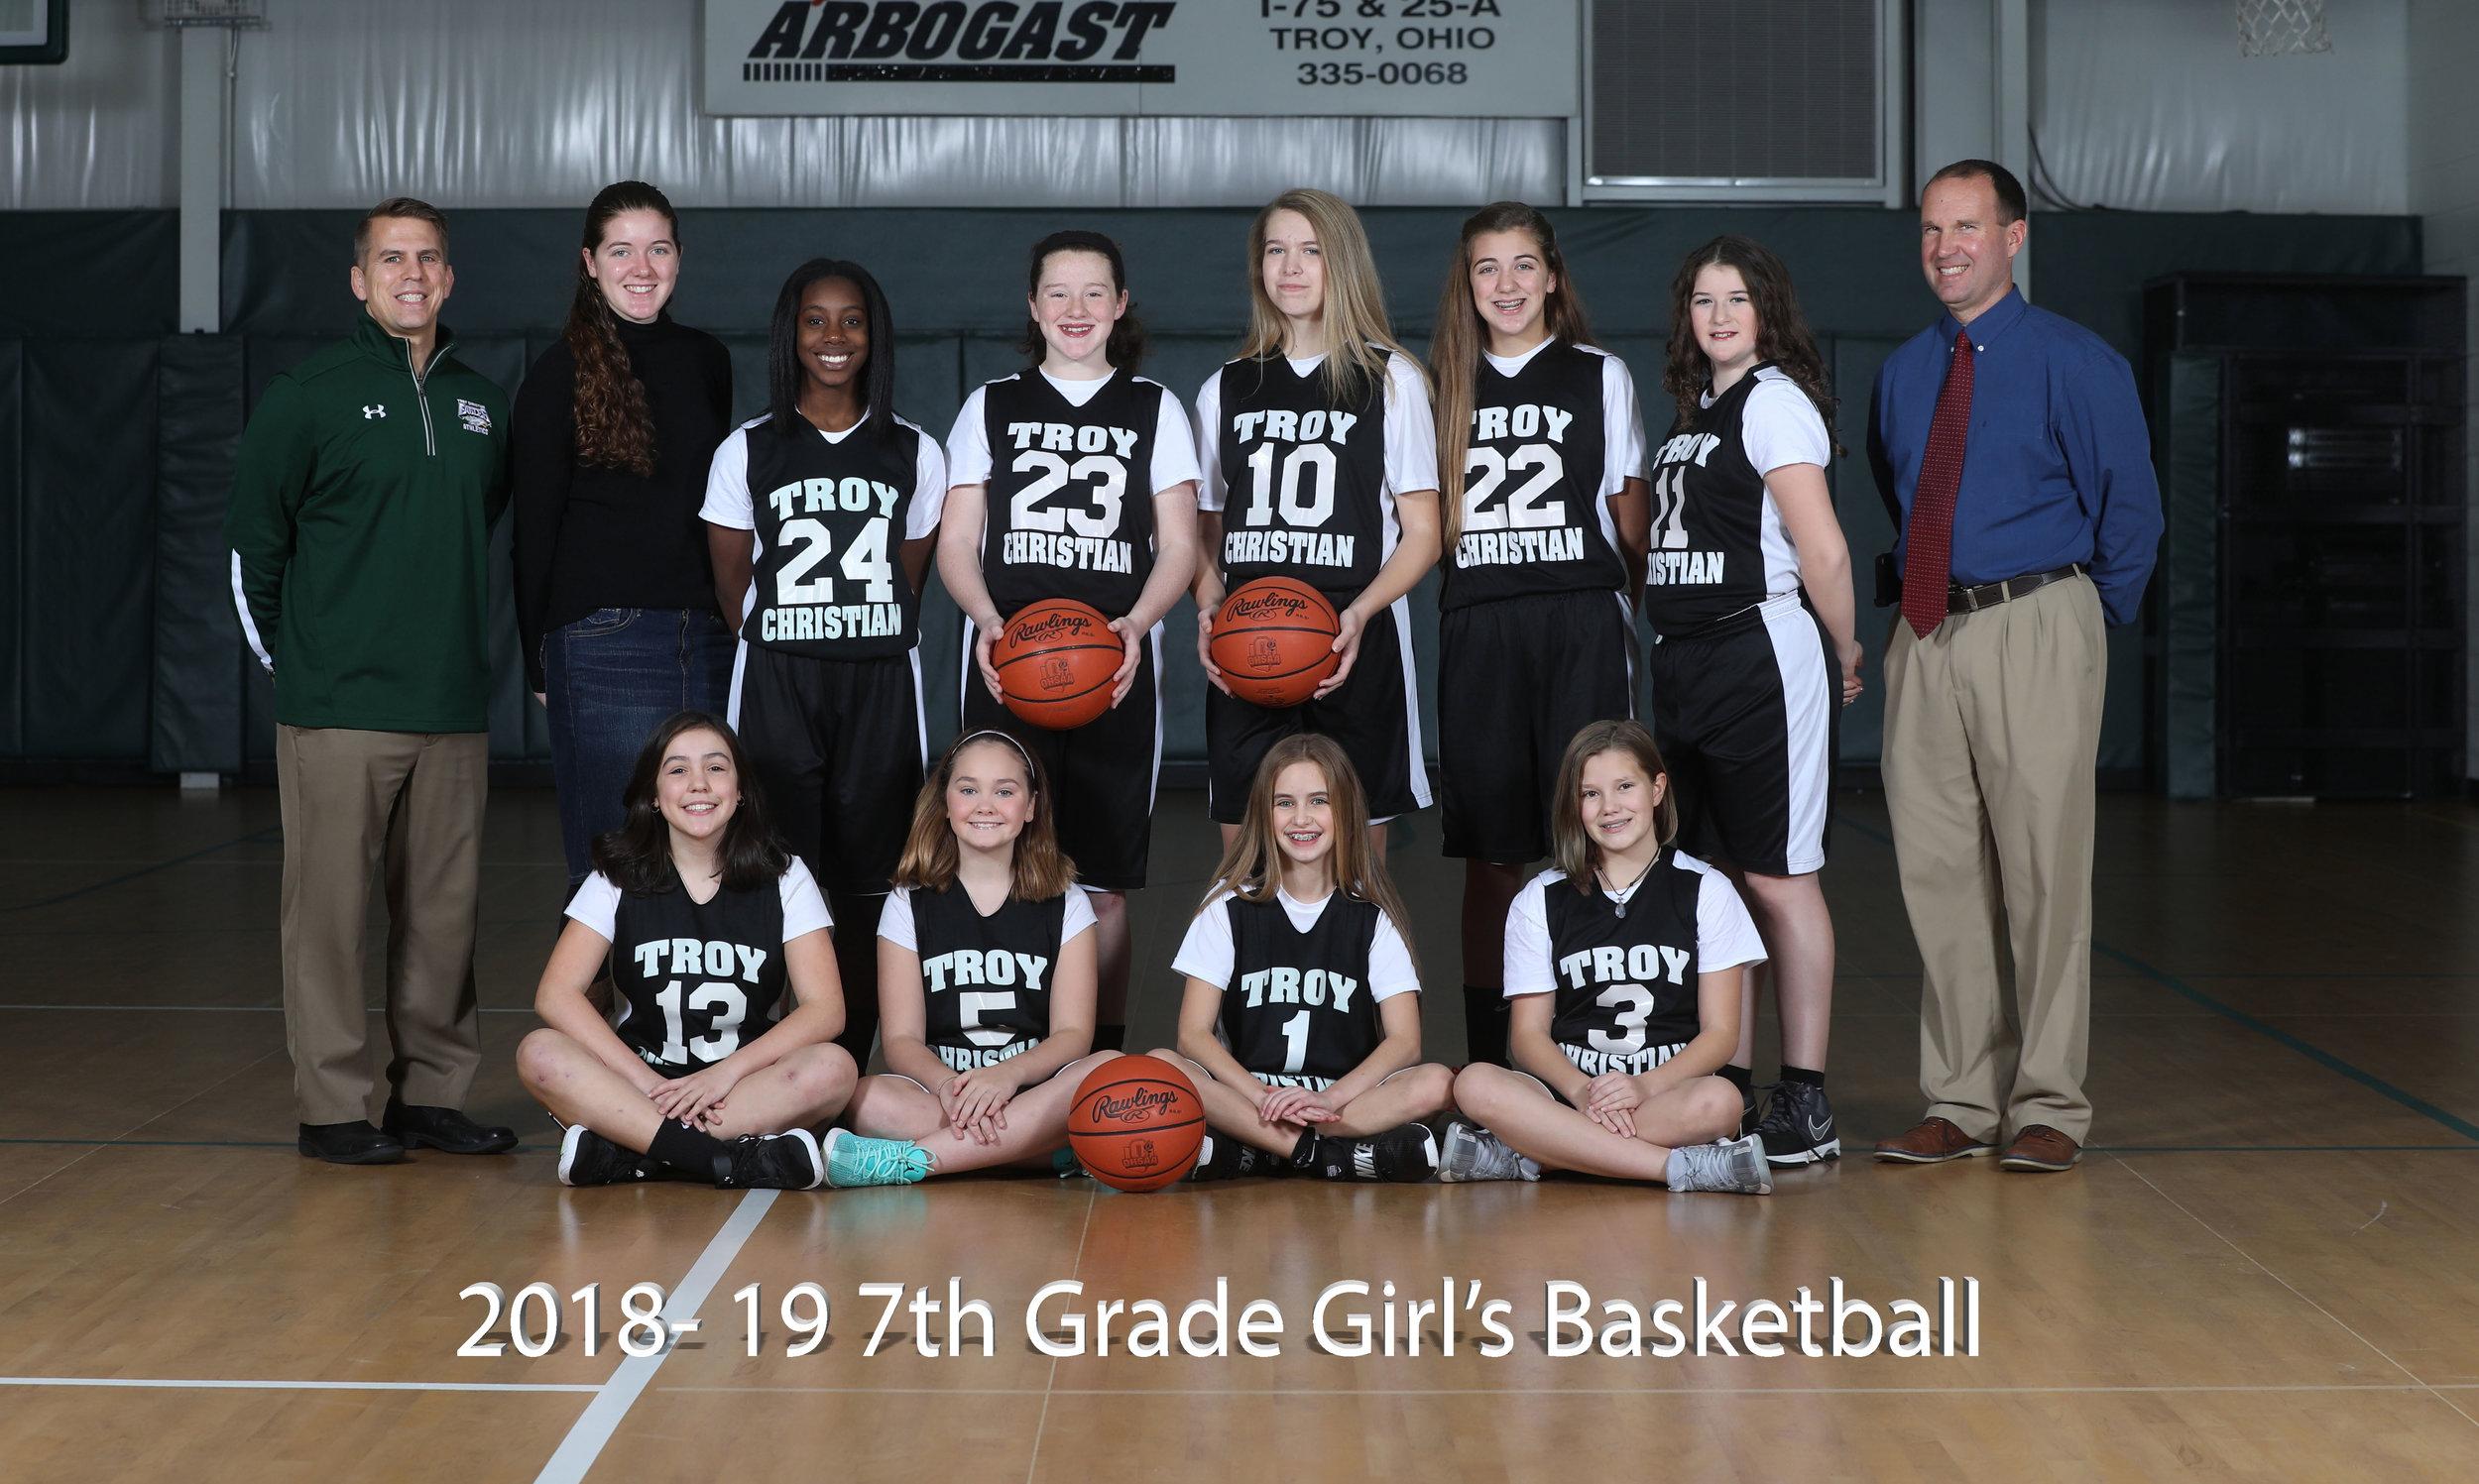 2017-18 7th Grade Girls Basketball